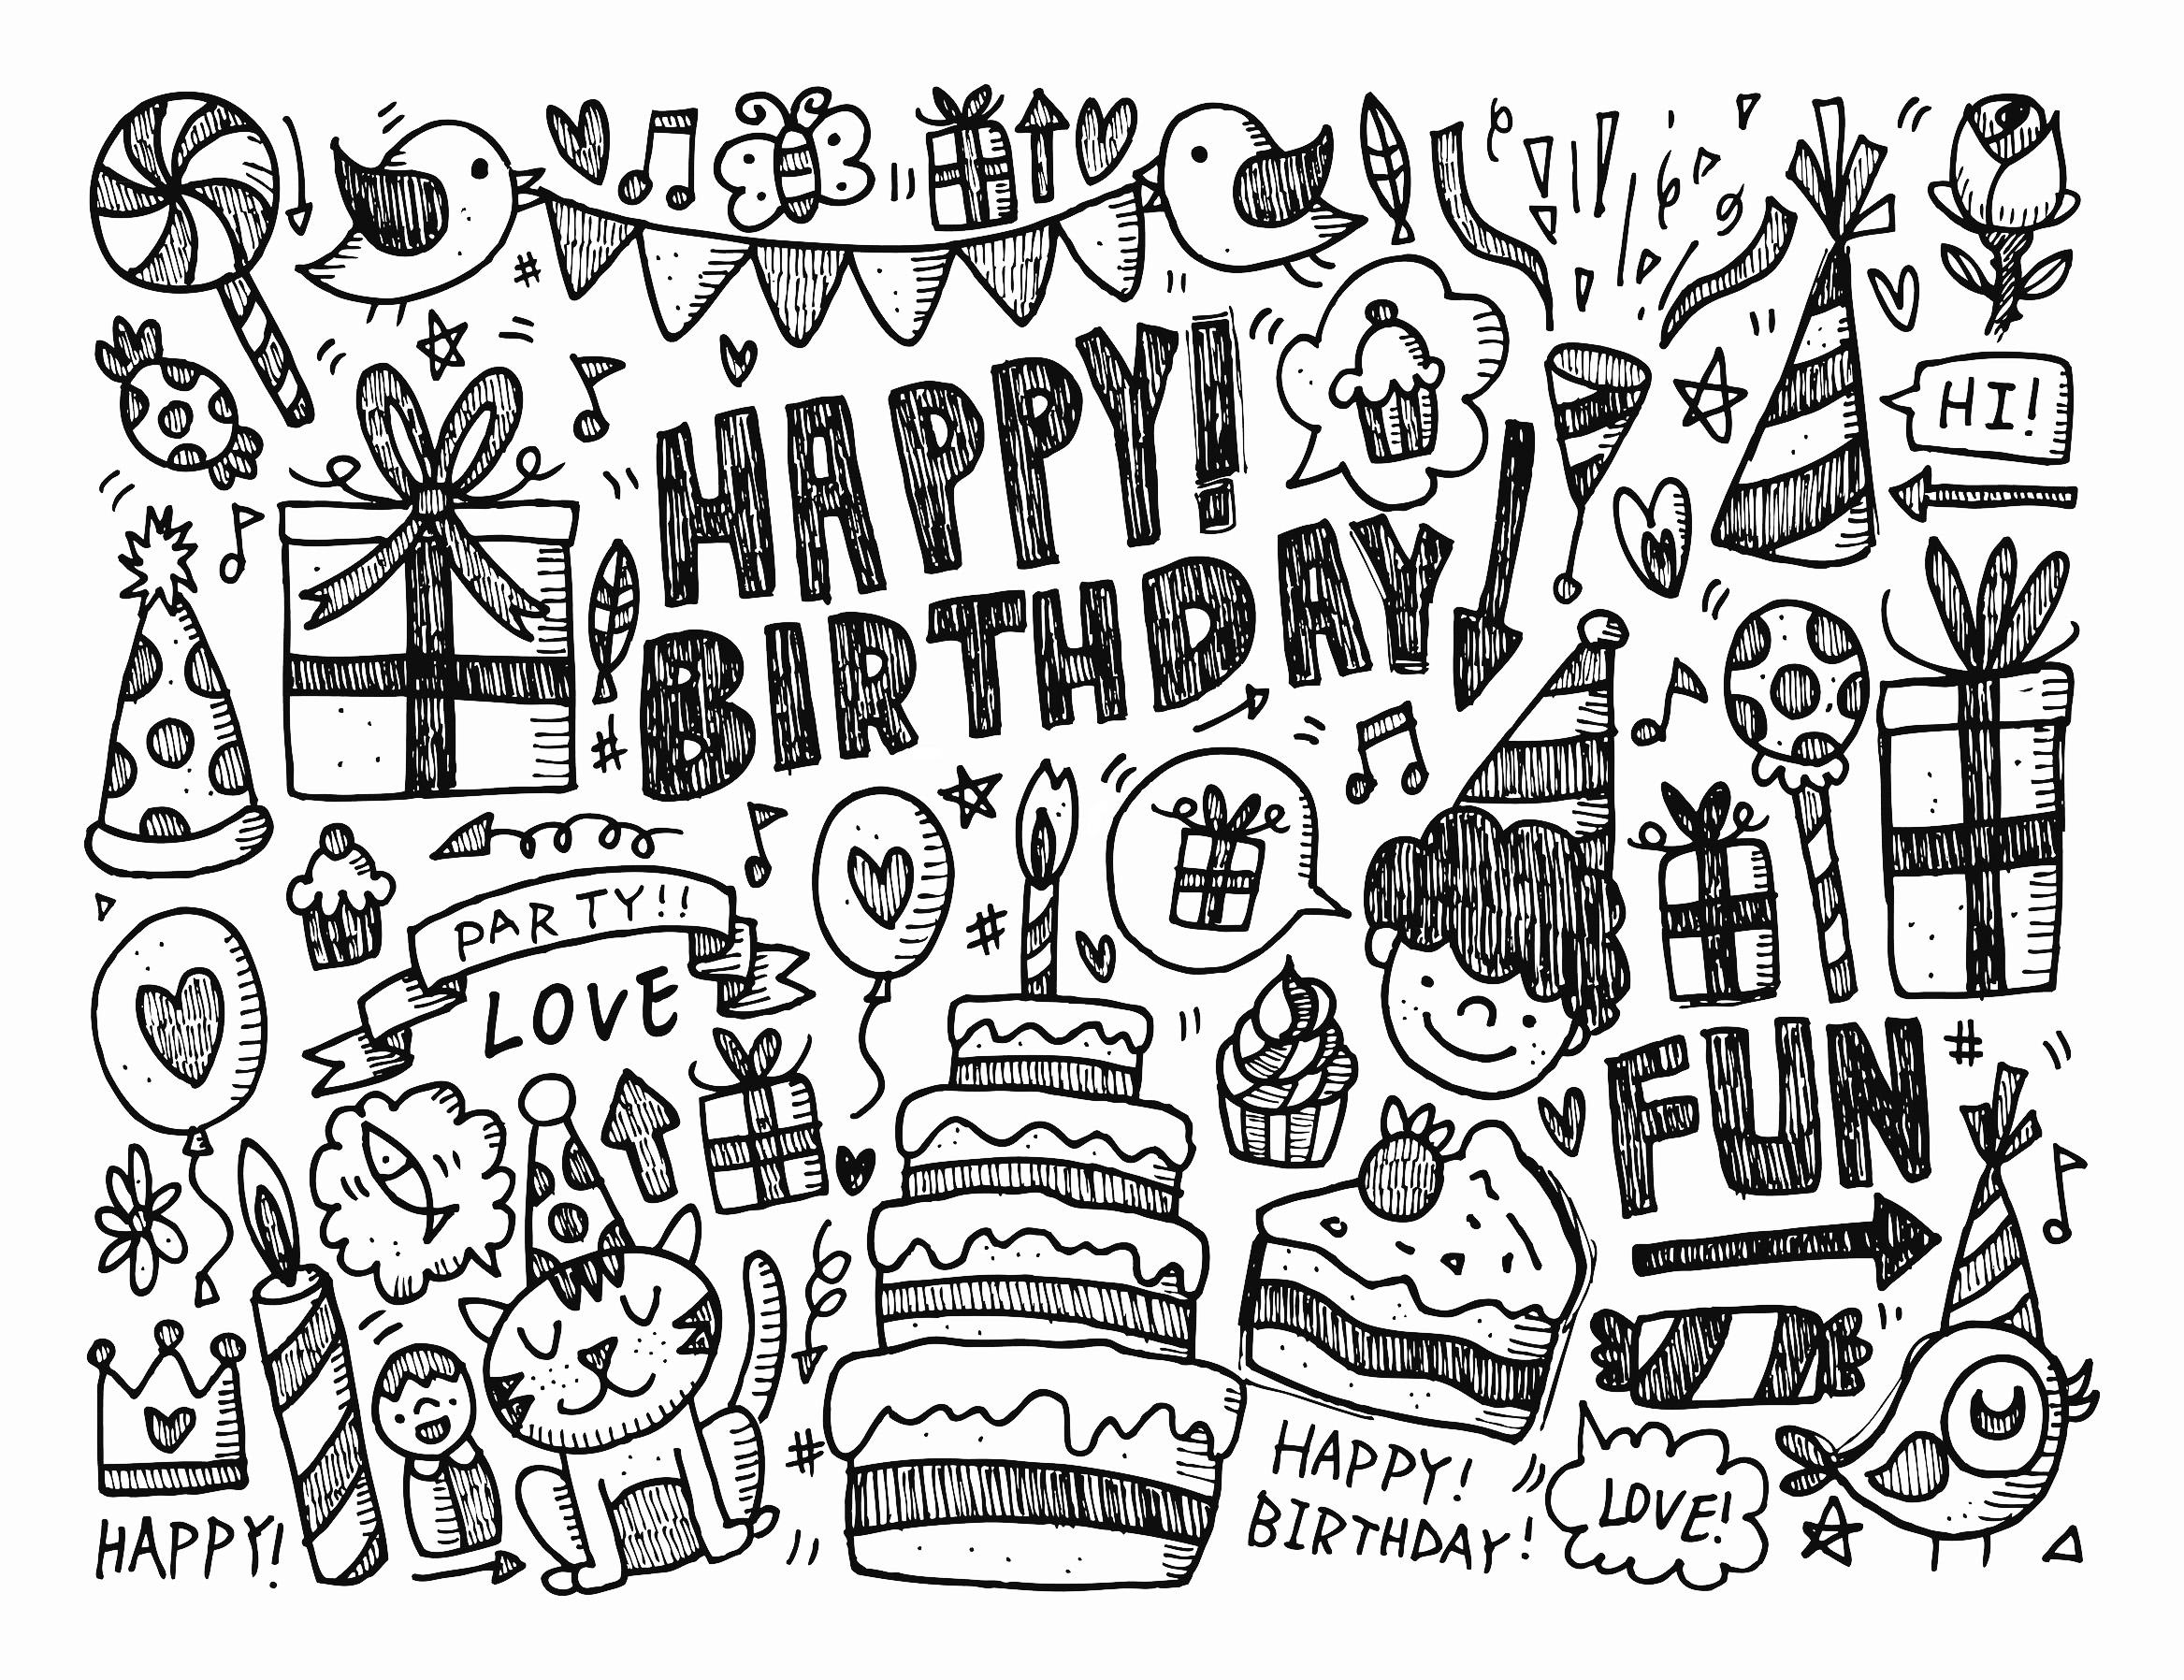 Doodle Happy Birthday By No Oo2008 Doodling Doodle Art